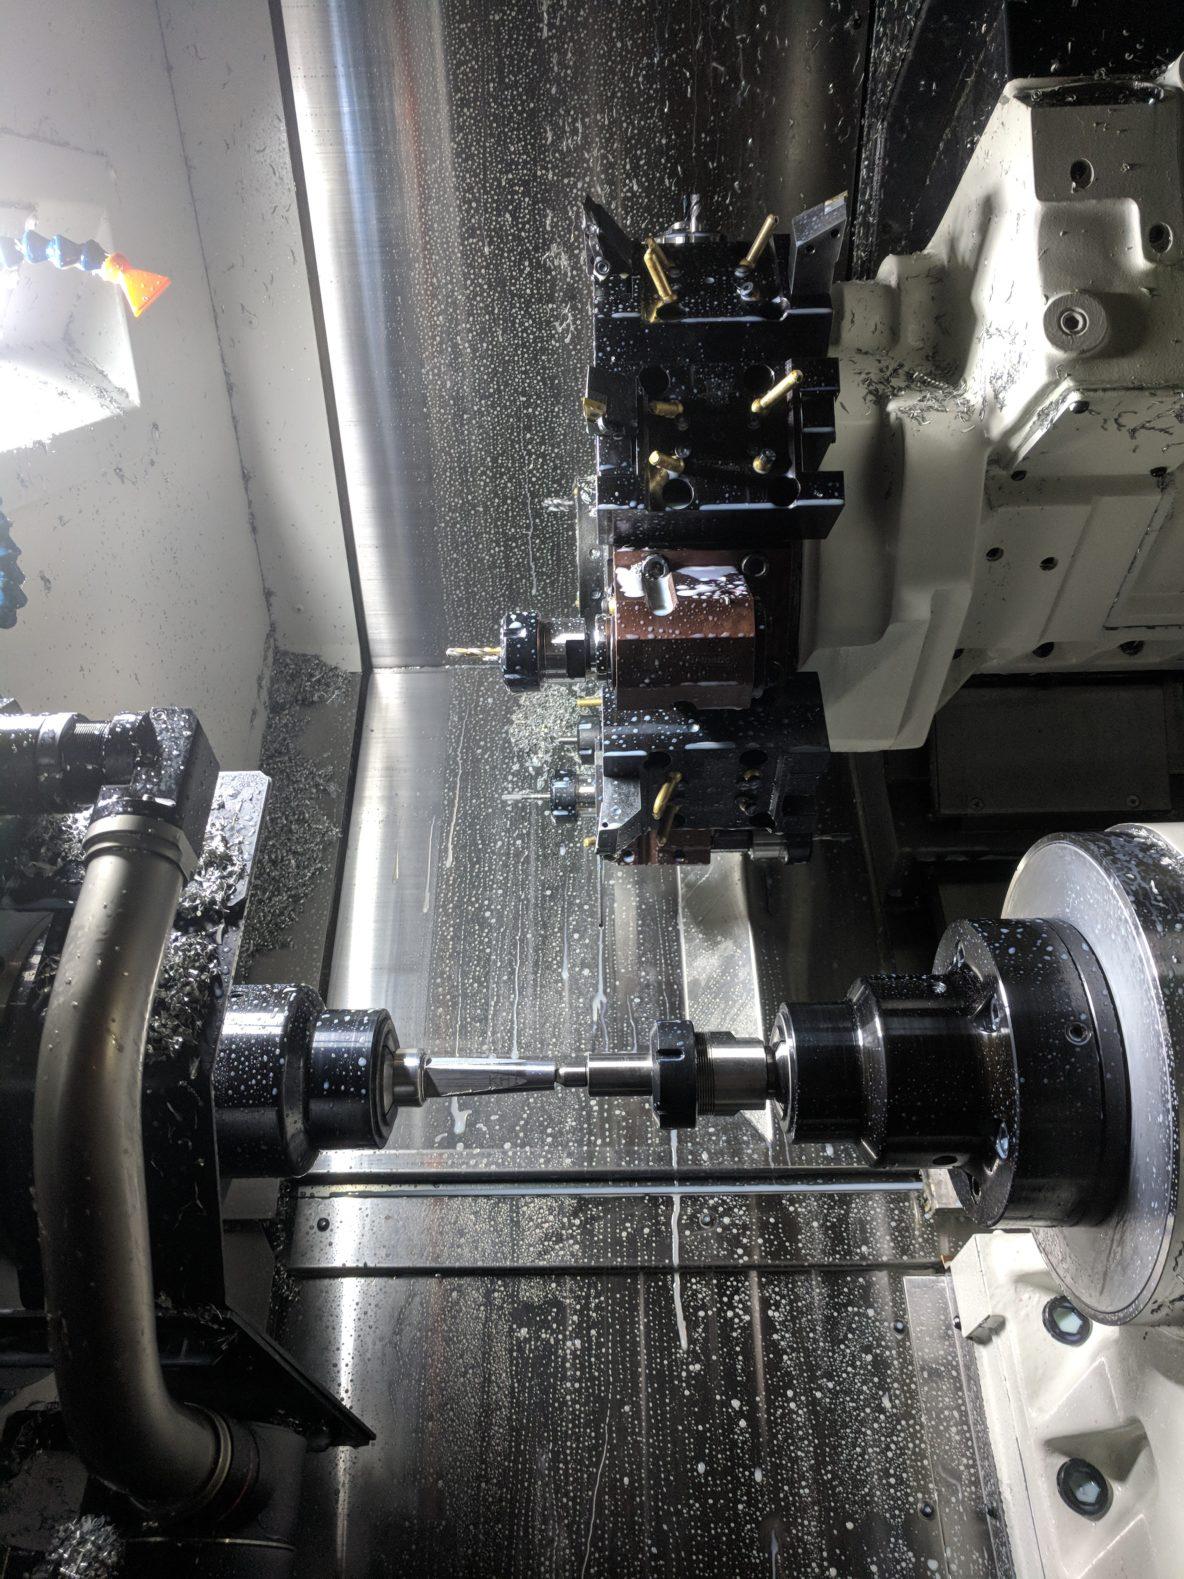 image of a cnc lathe